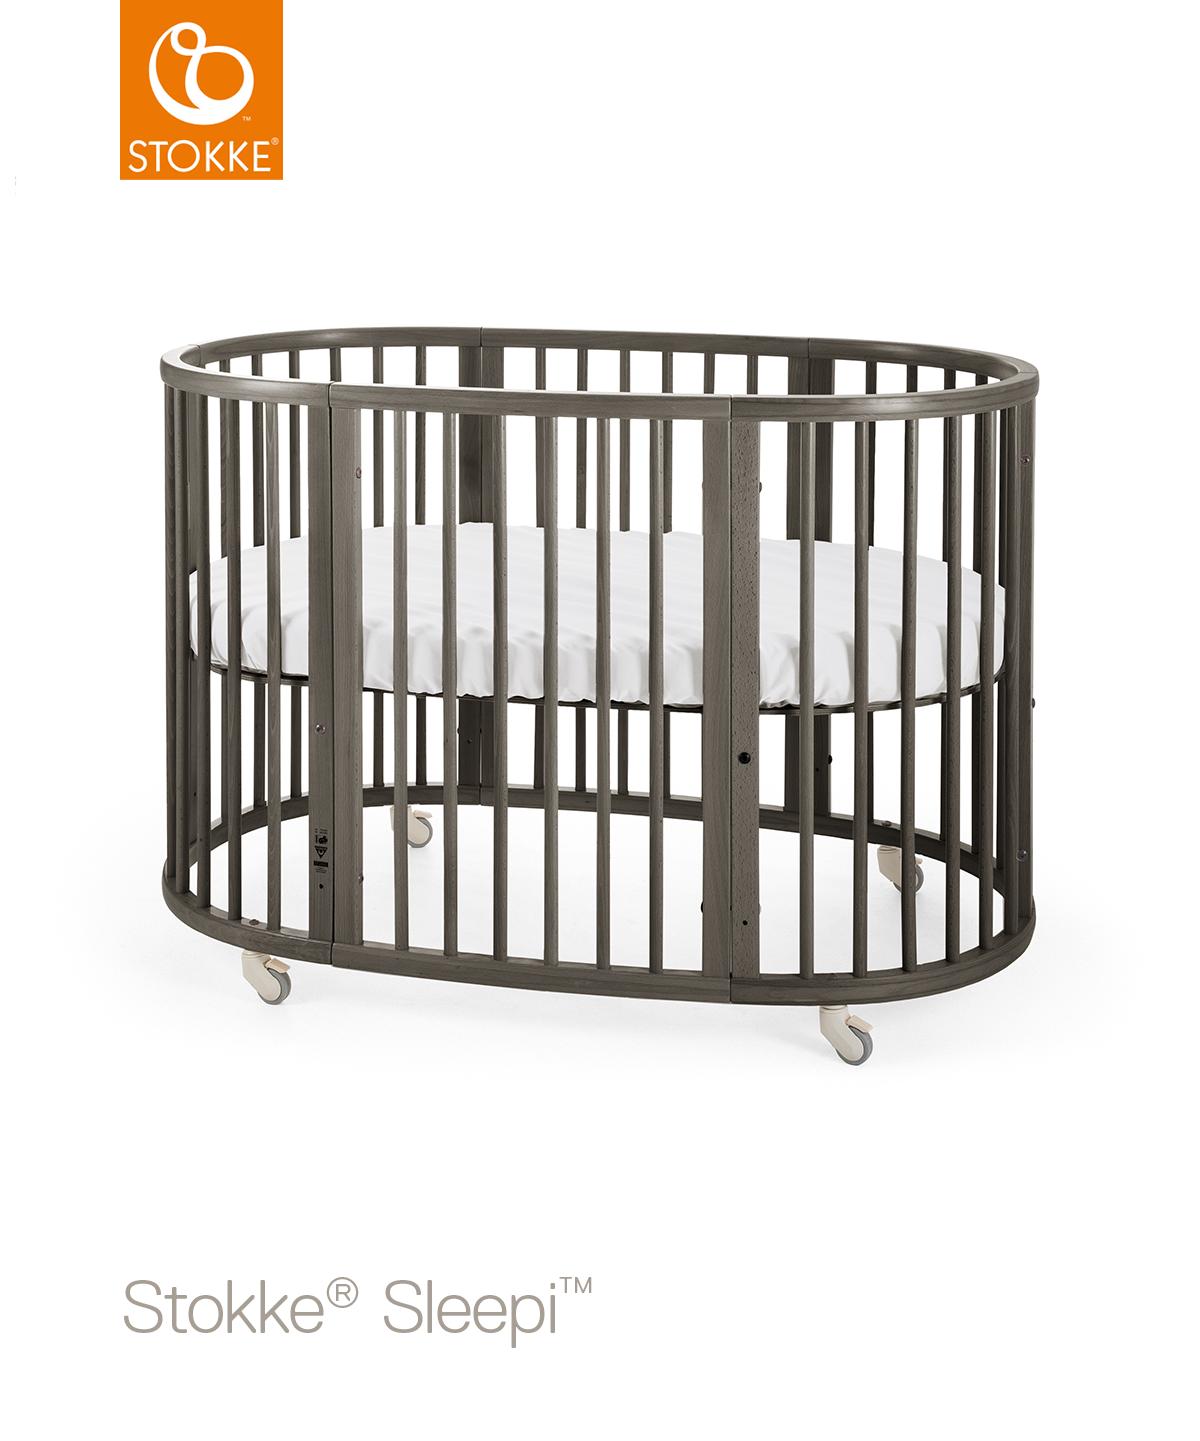 Stokke® Sleepi™ Ledikant